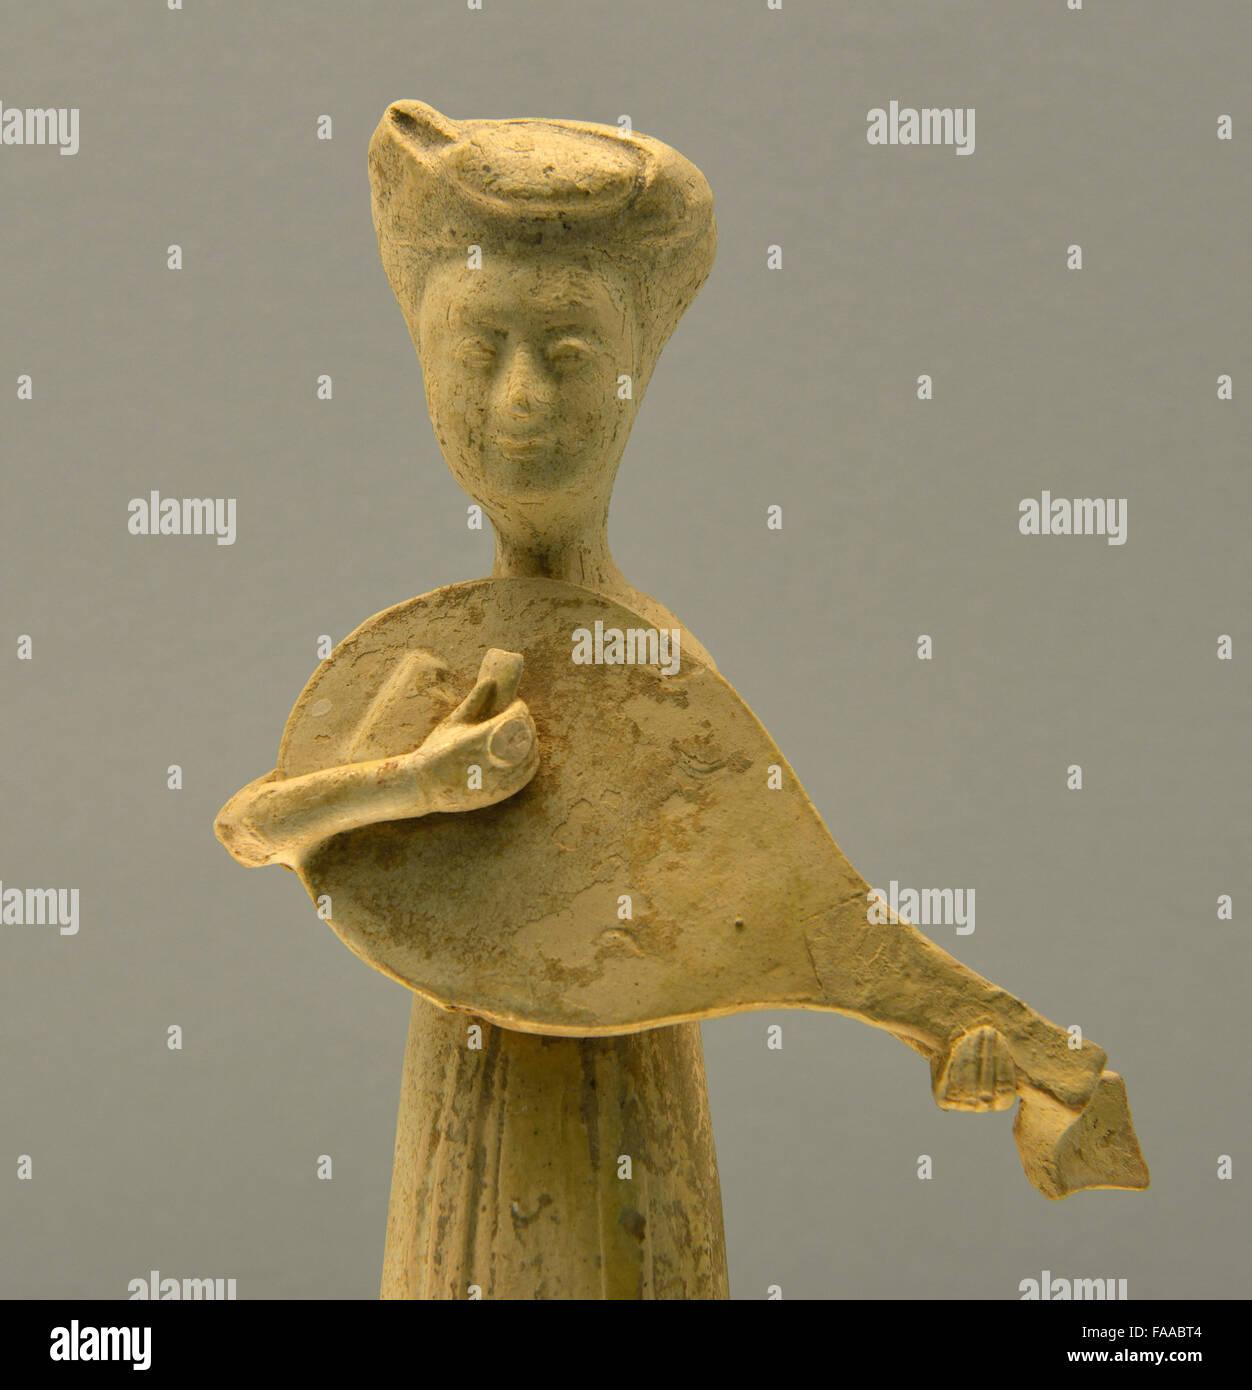 Weiß glasierte Keramik Figur der Frau spielt Pipa(Lute). SUI, A.D.581-618. Shanghai Museum. Stockbild